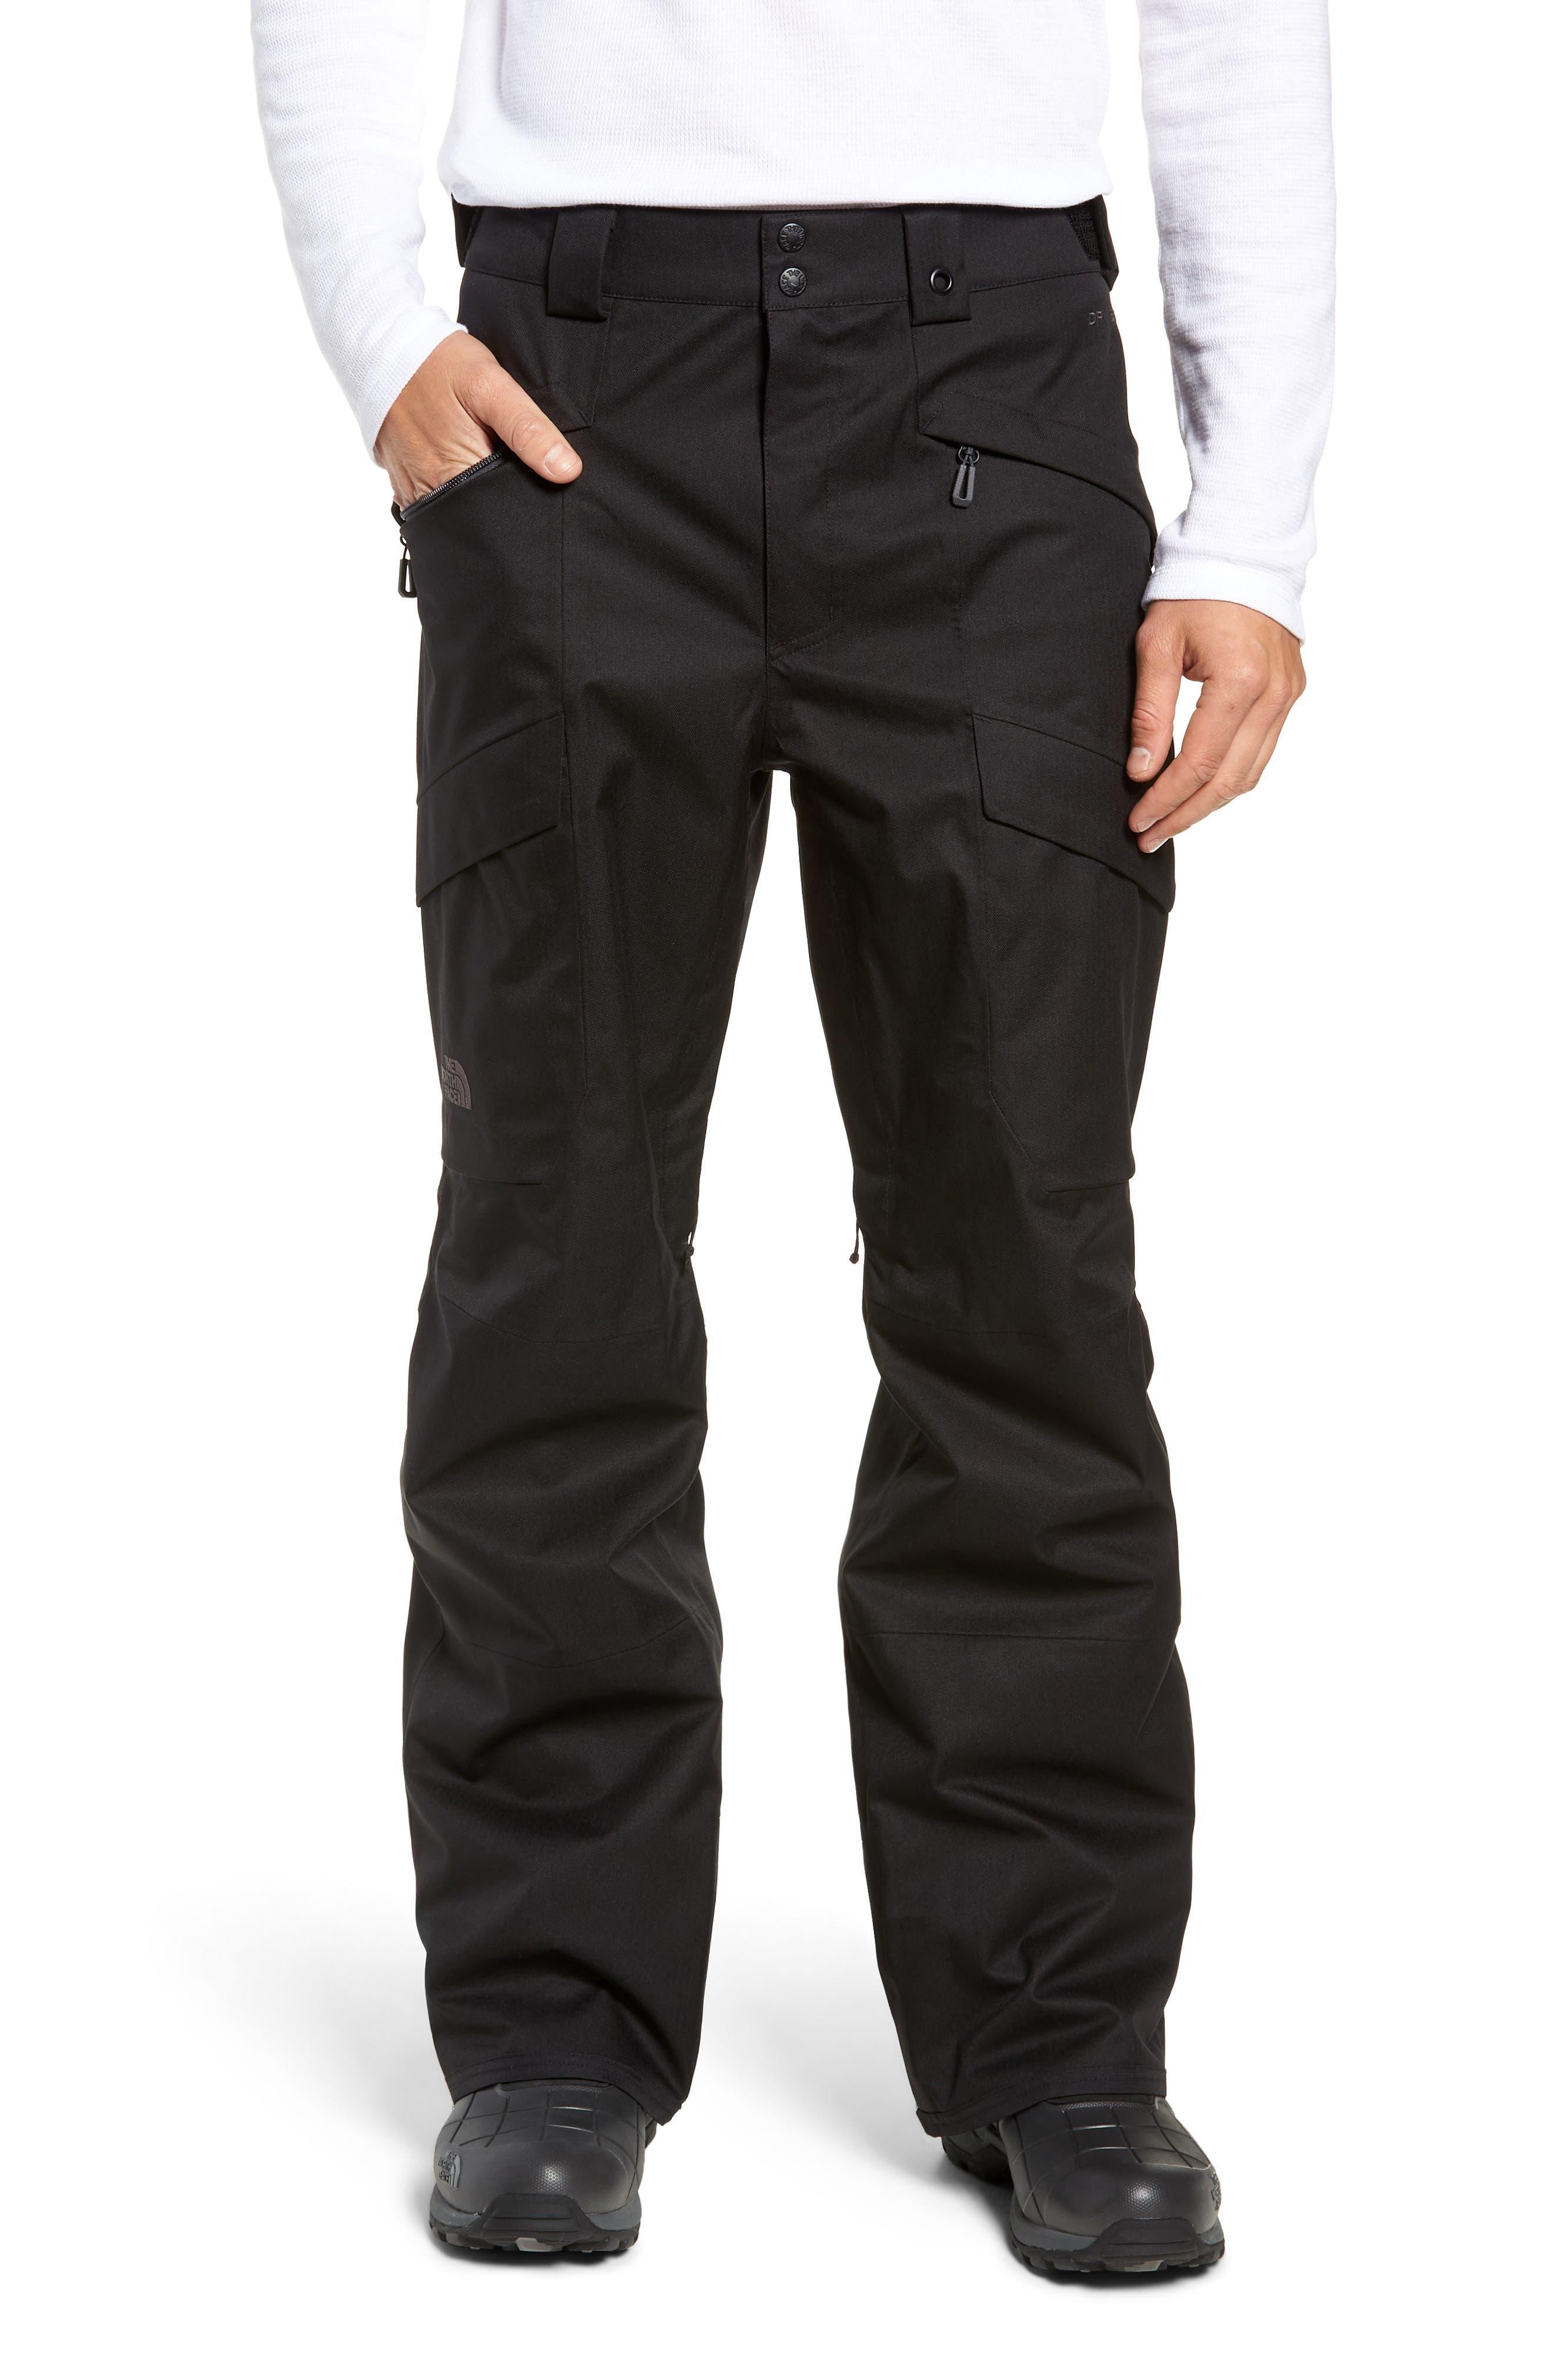 Gatekeeper Waterproof Pants,                             Main thumbnail 1, color,                             TNF BLACK/TNF BLACK